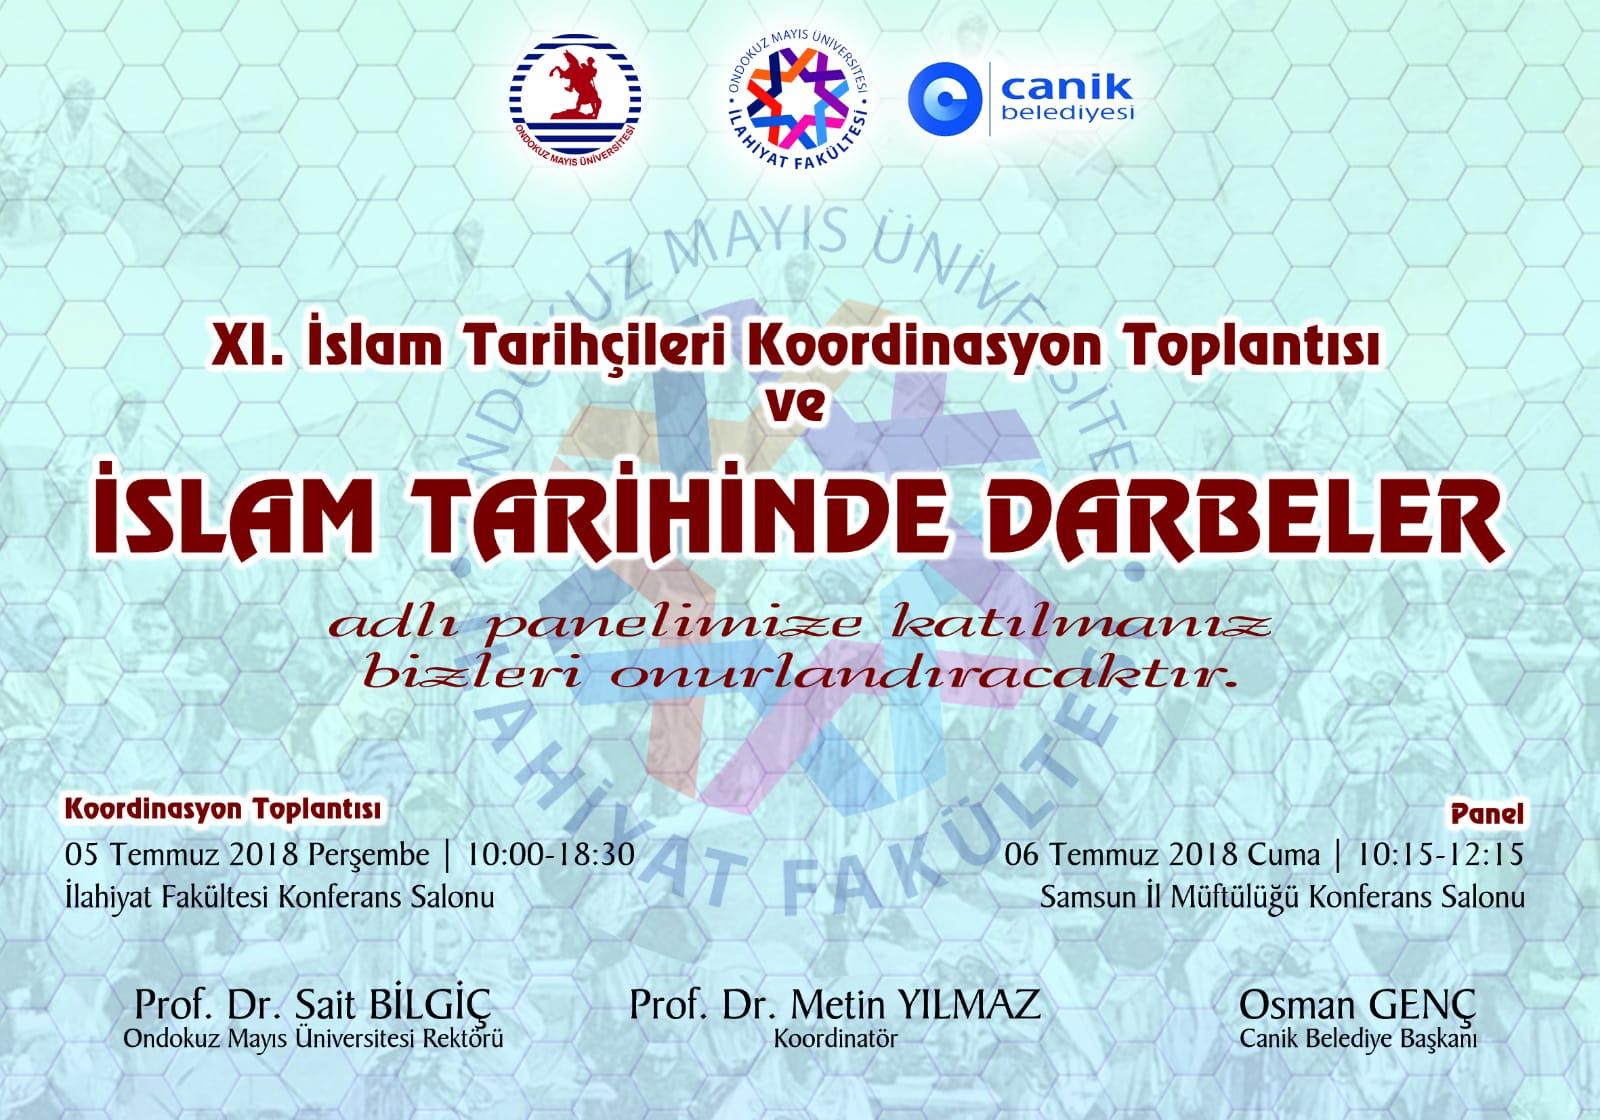 https://www.omu.edu.tr/sites/default/files/omu_islam_tarihinde_darbeler_1.jpg